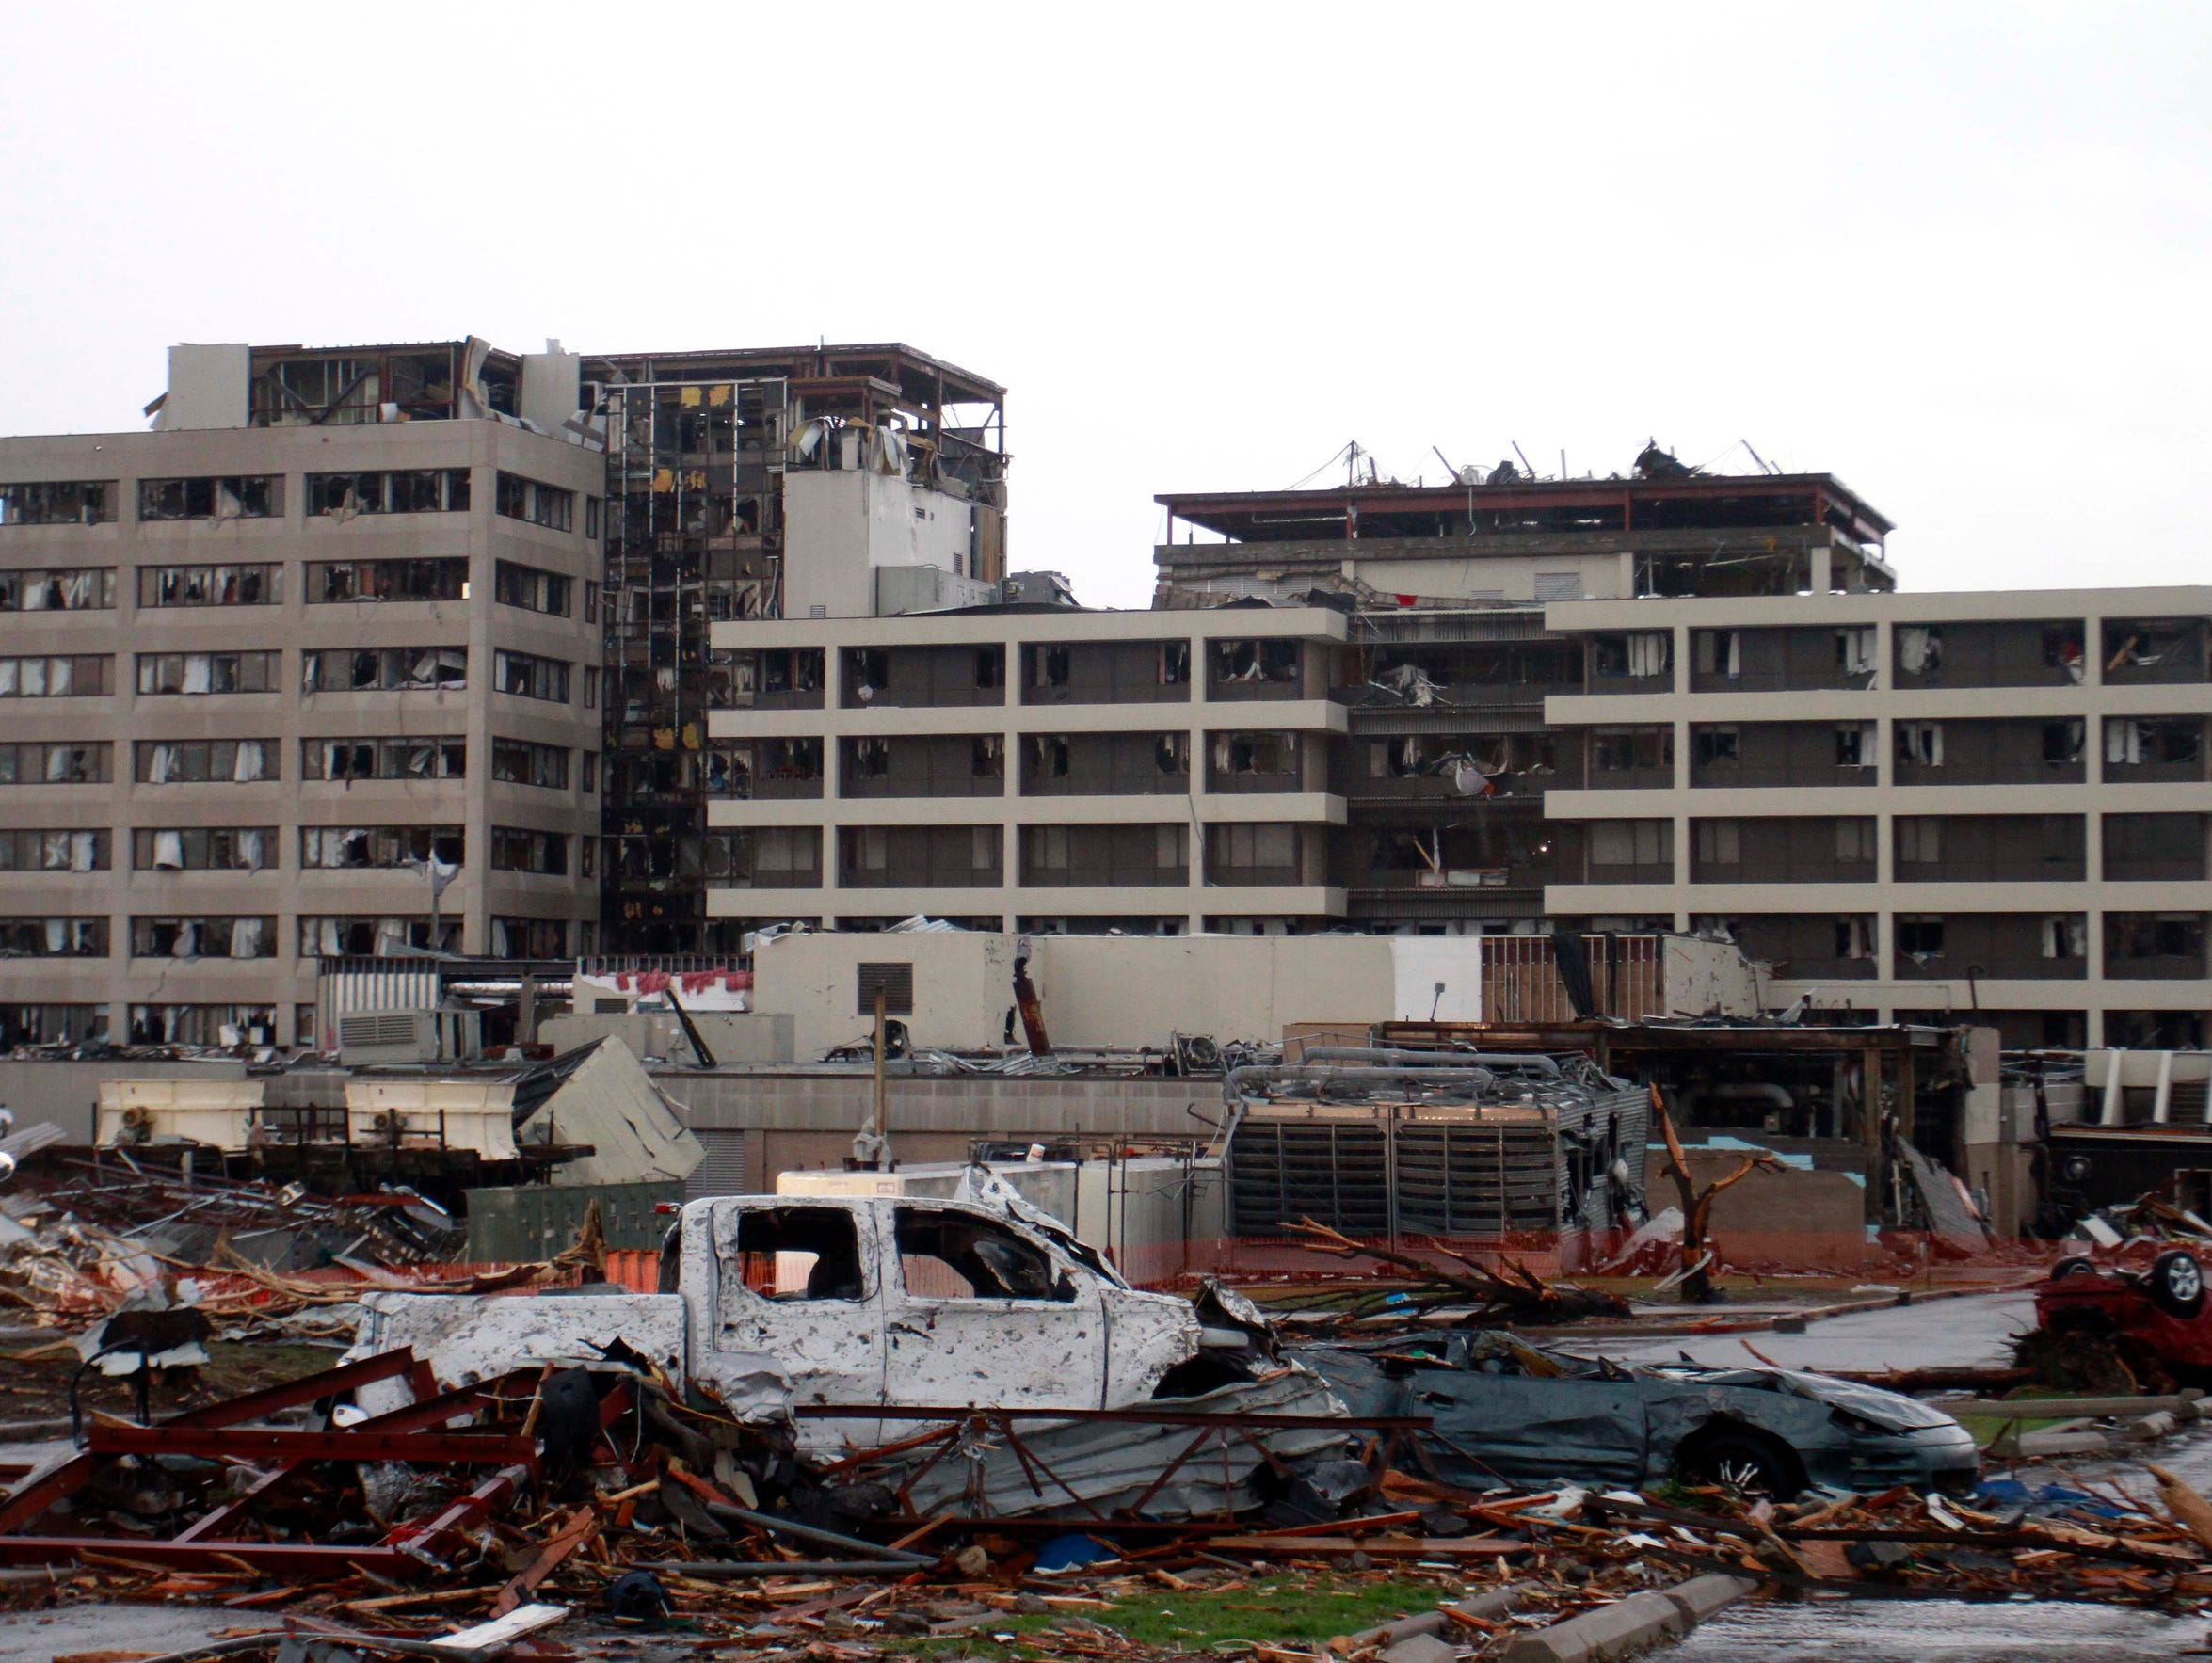 St. Johns Medical Center in Joplin was severely after